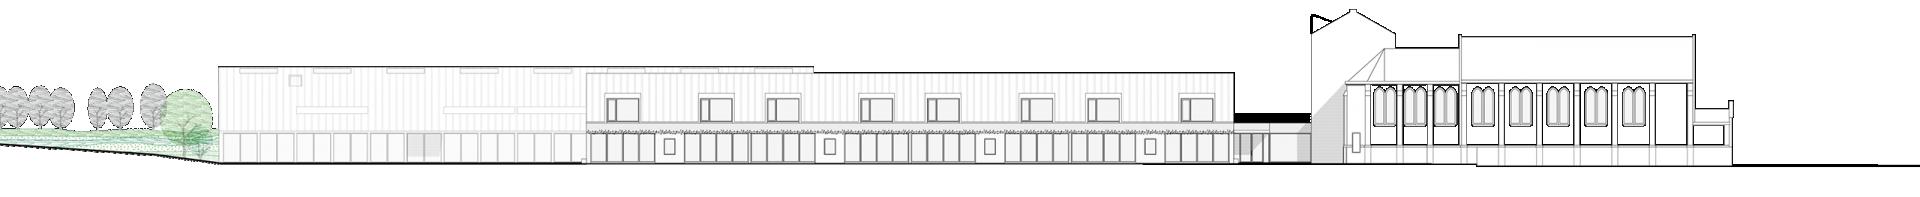 Bosco Section 1